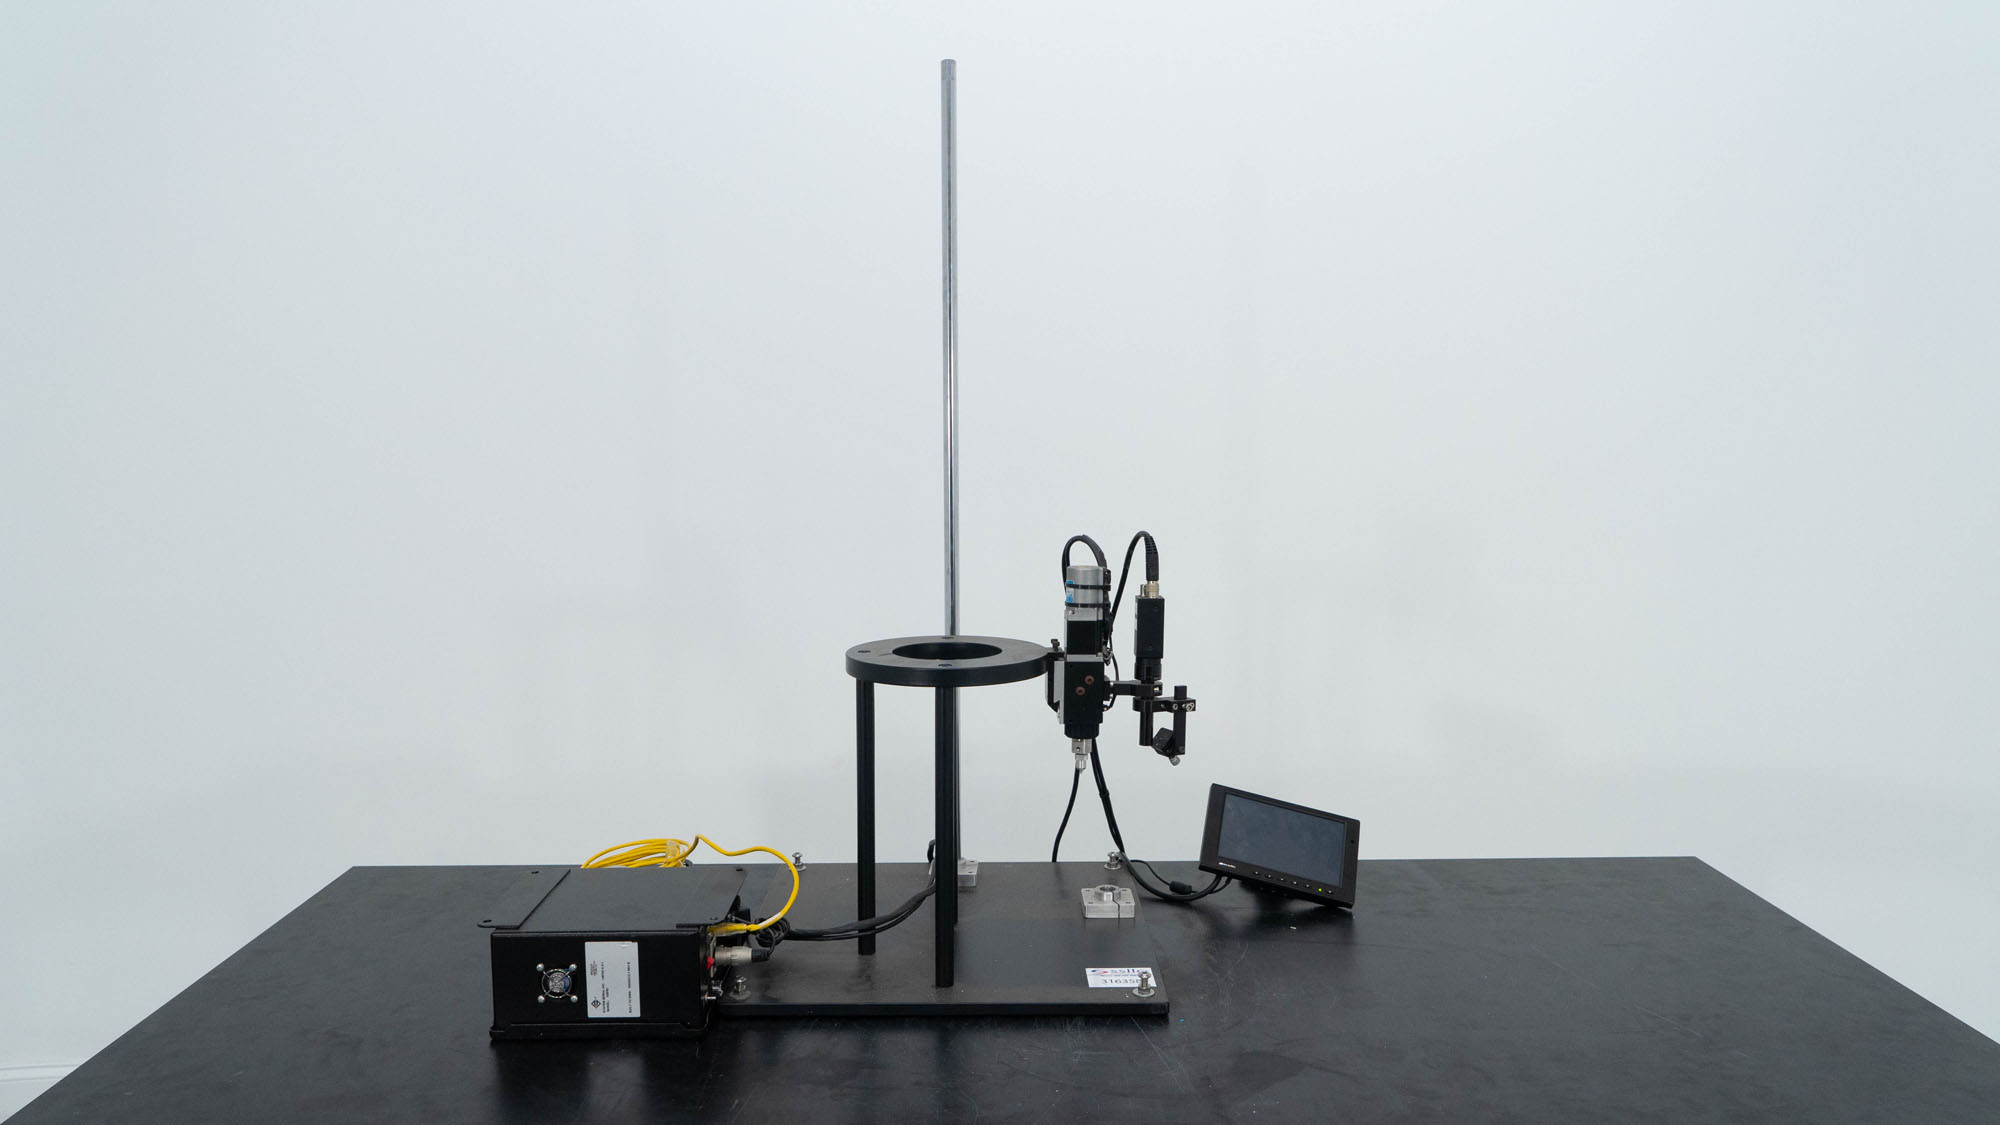 AeroTech Laser Scanner